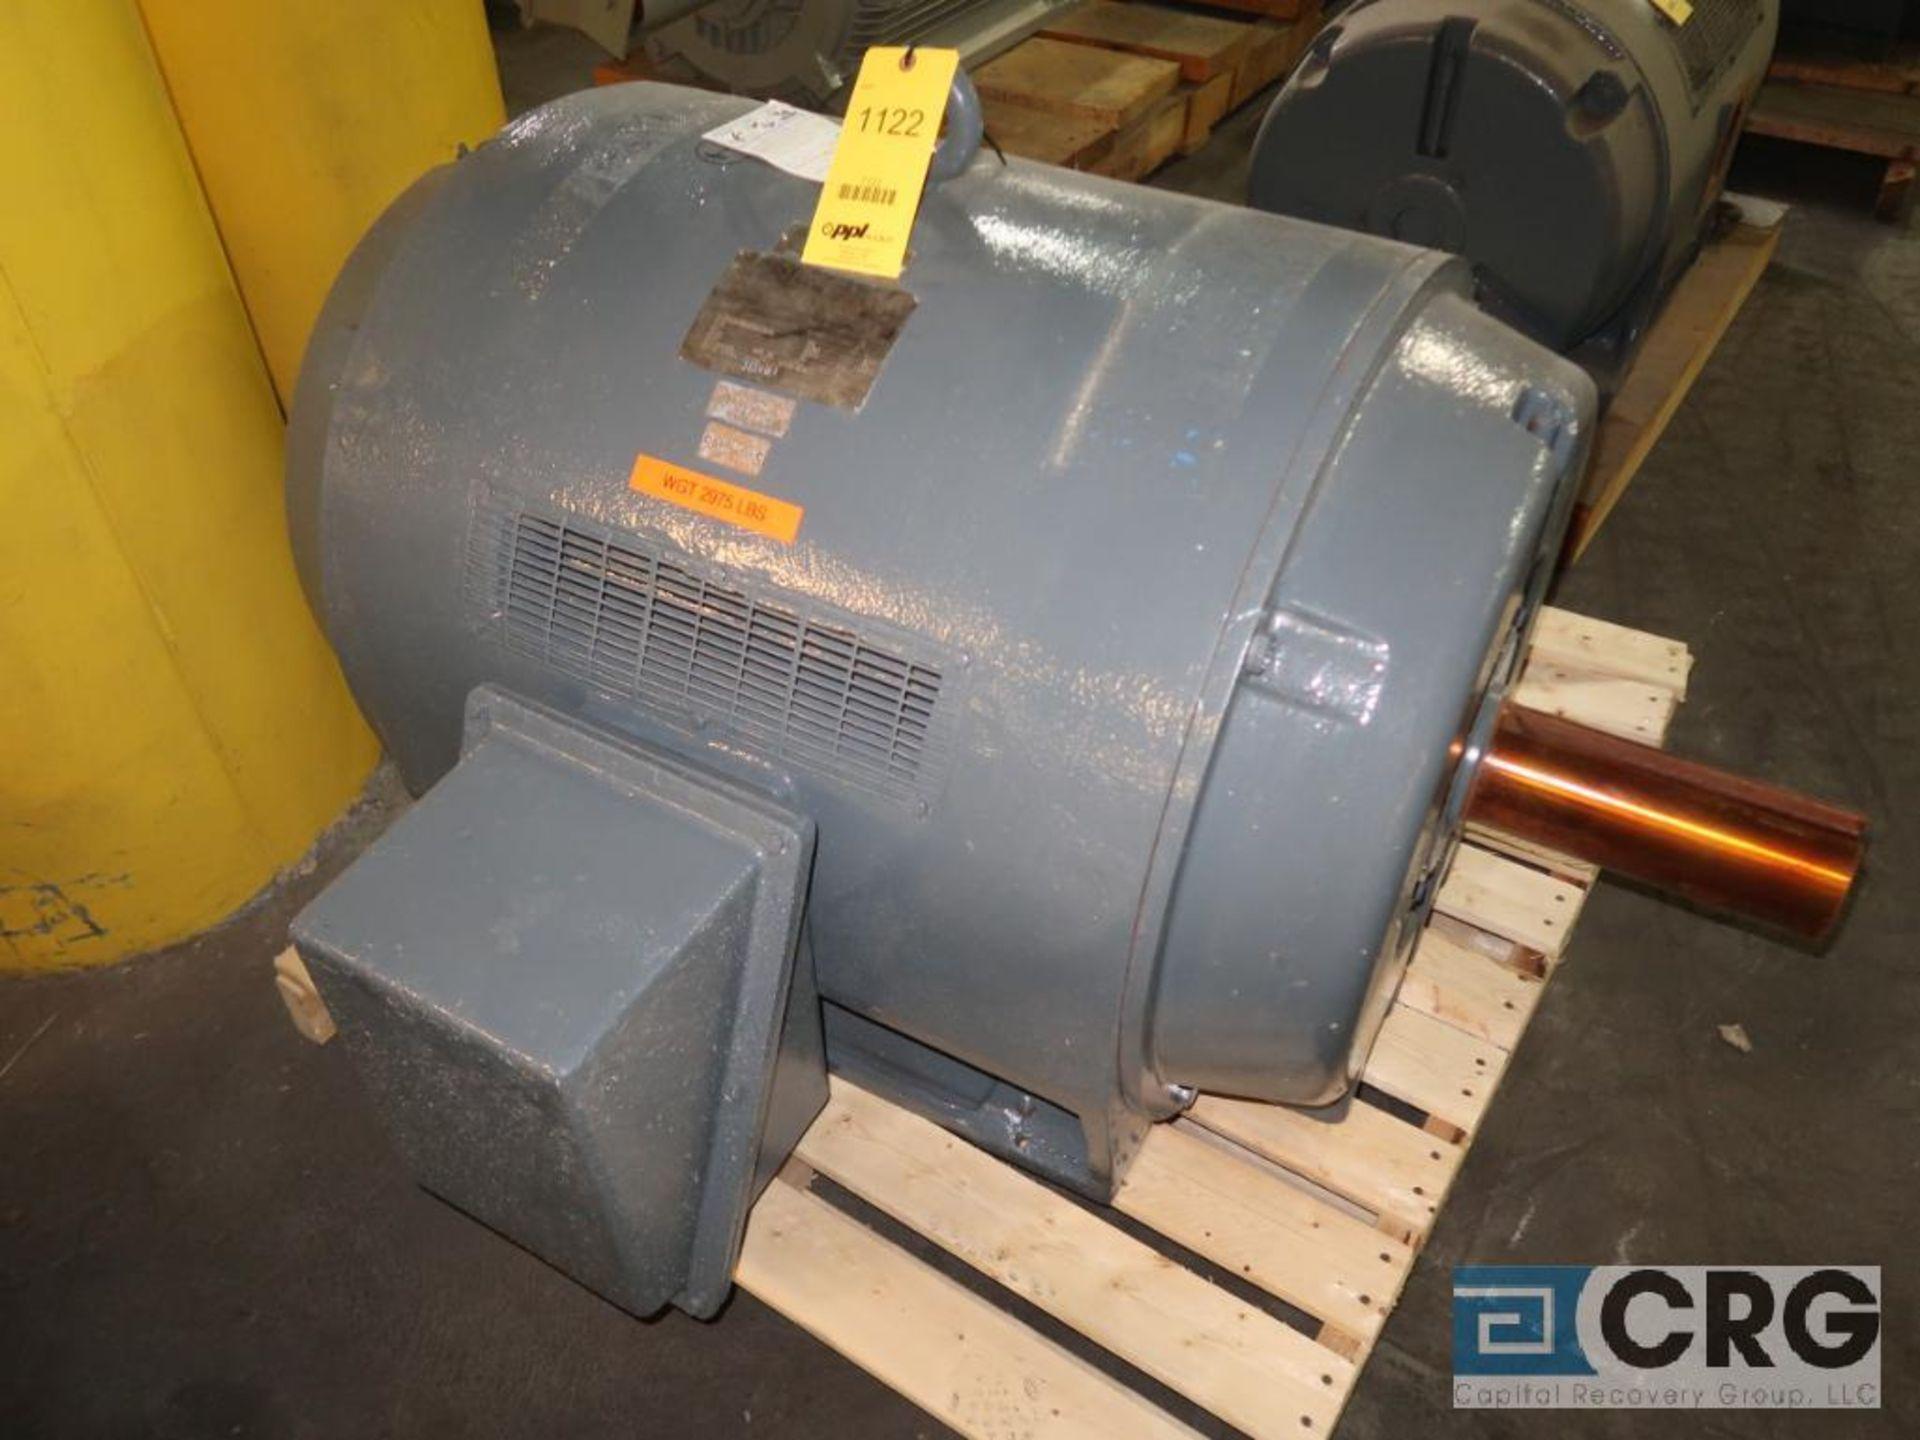 Siemens-Allis induction motor, 400 HP, 1,185 RPMs, 2,300 volt, 3 ph., 507U frame (Finish Building)